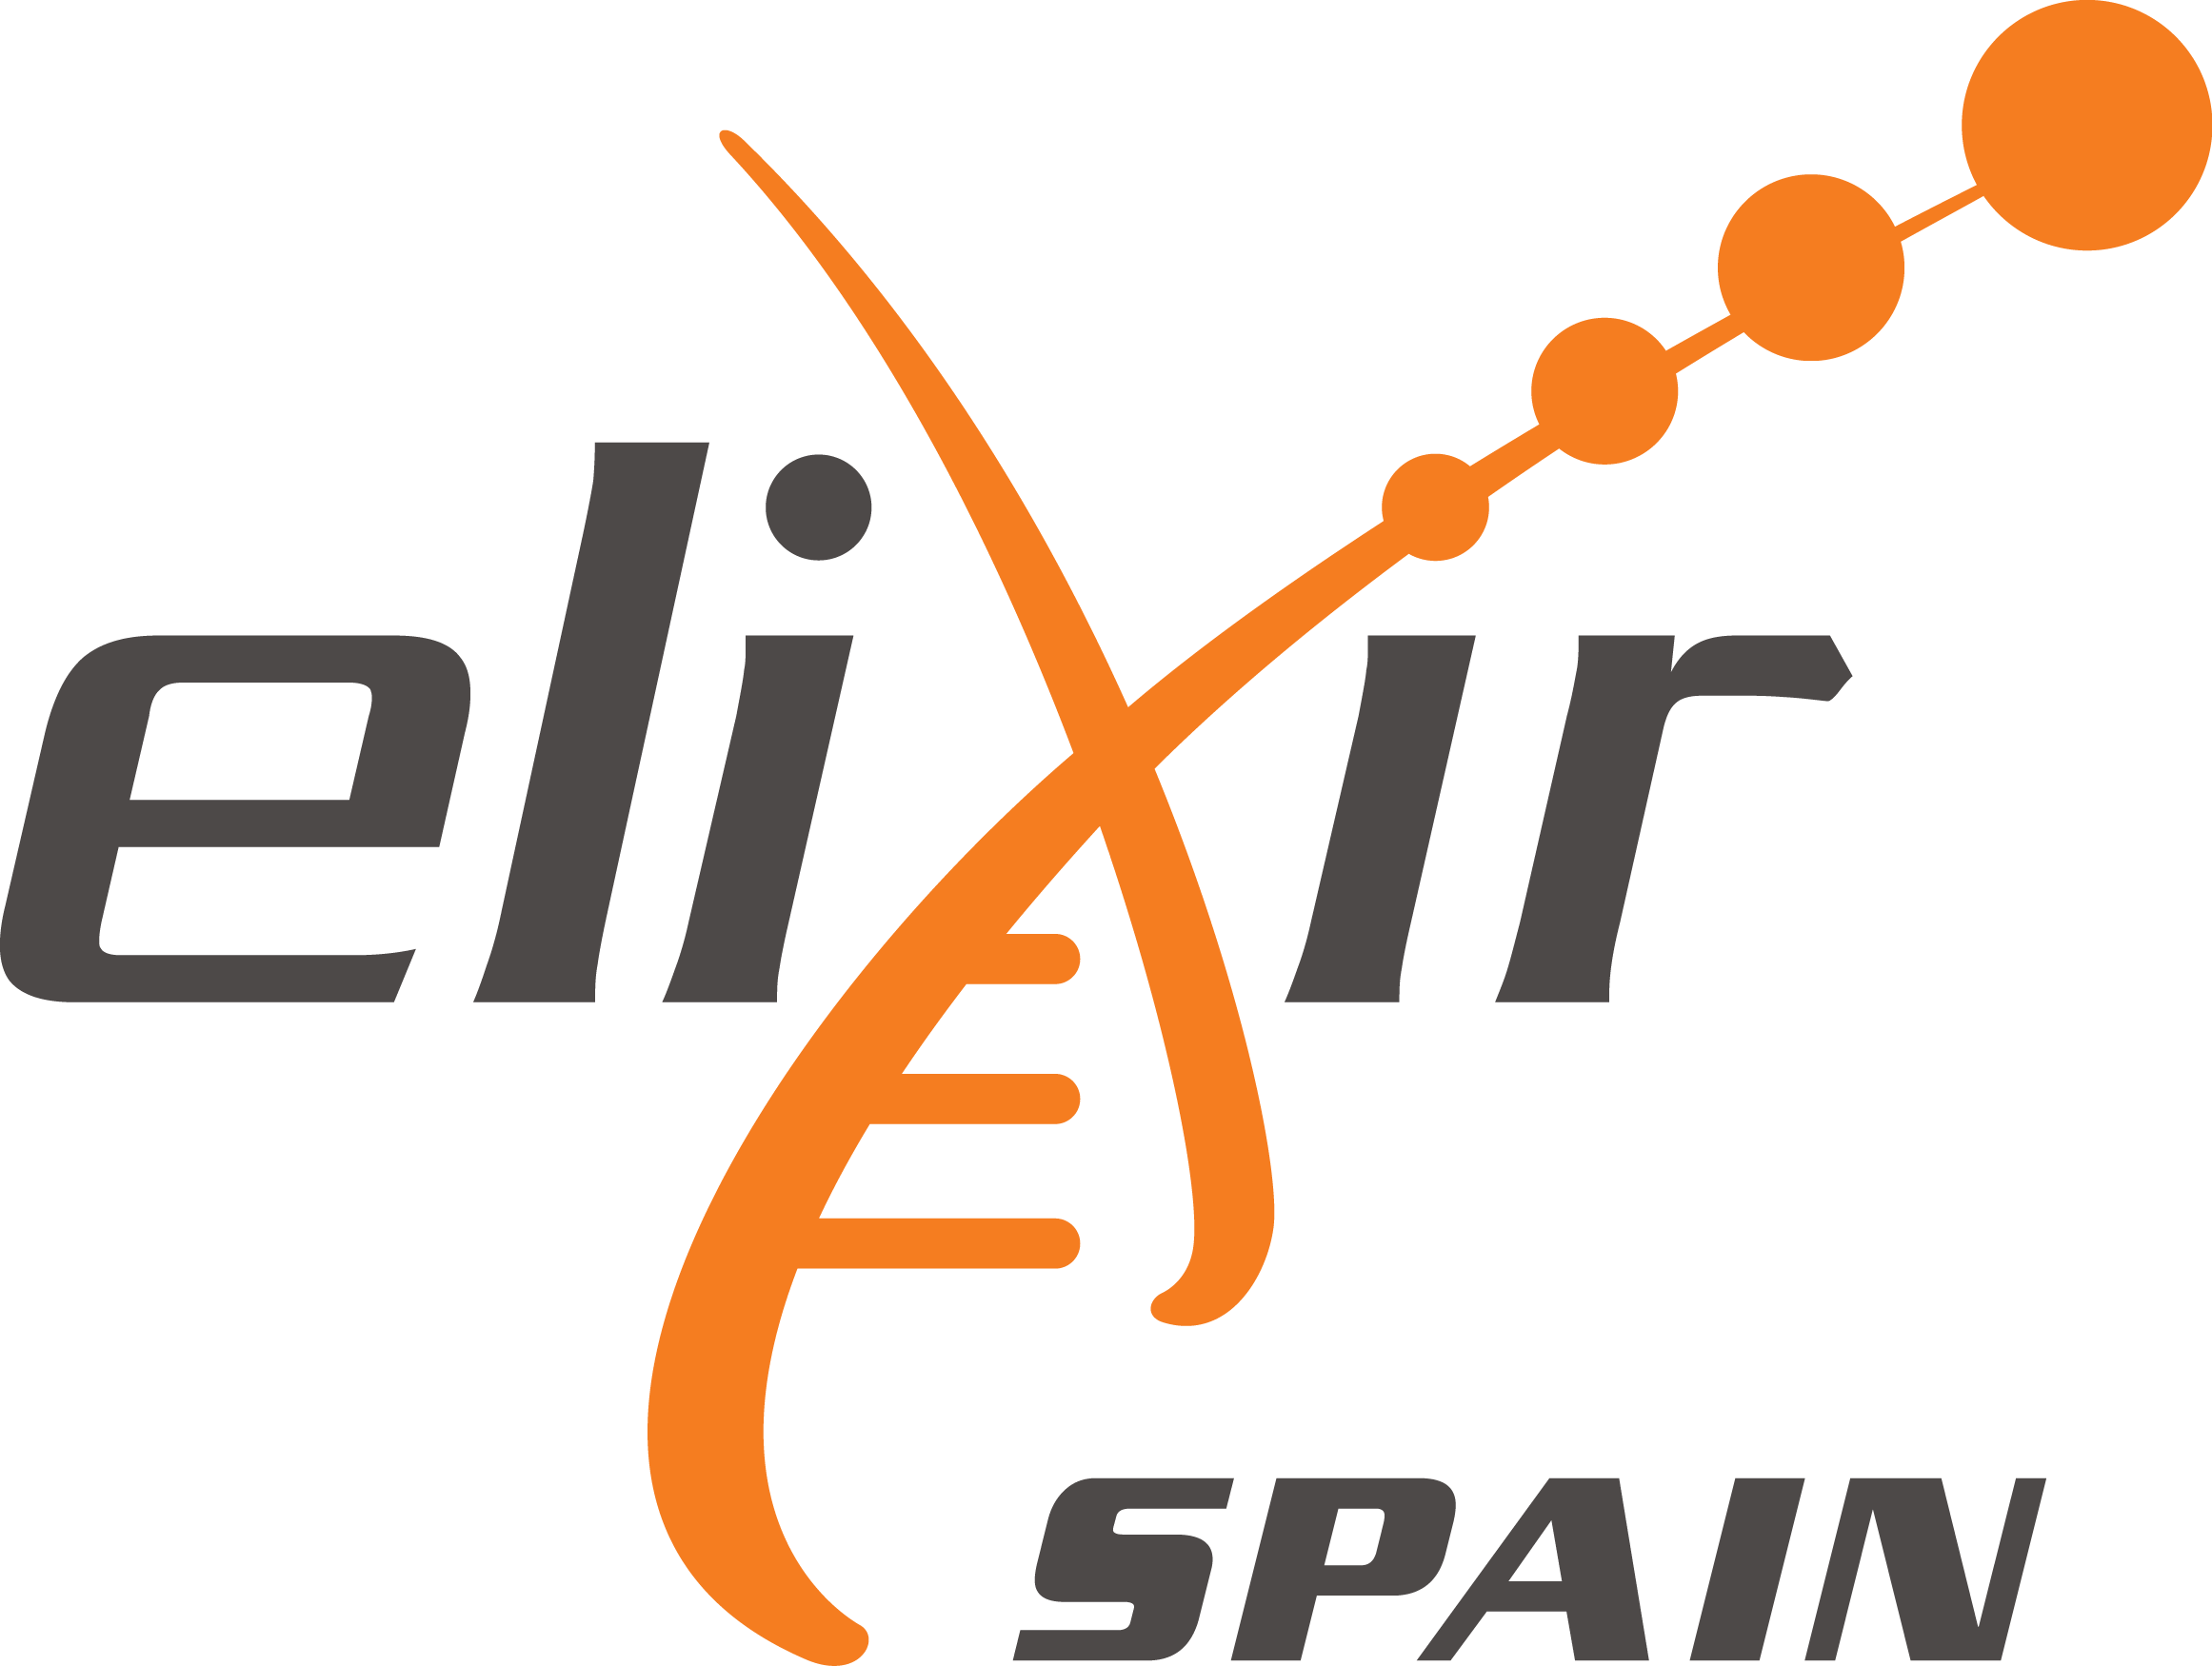 ELIXIR Spain